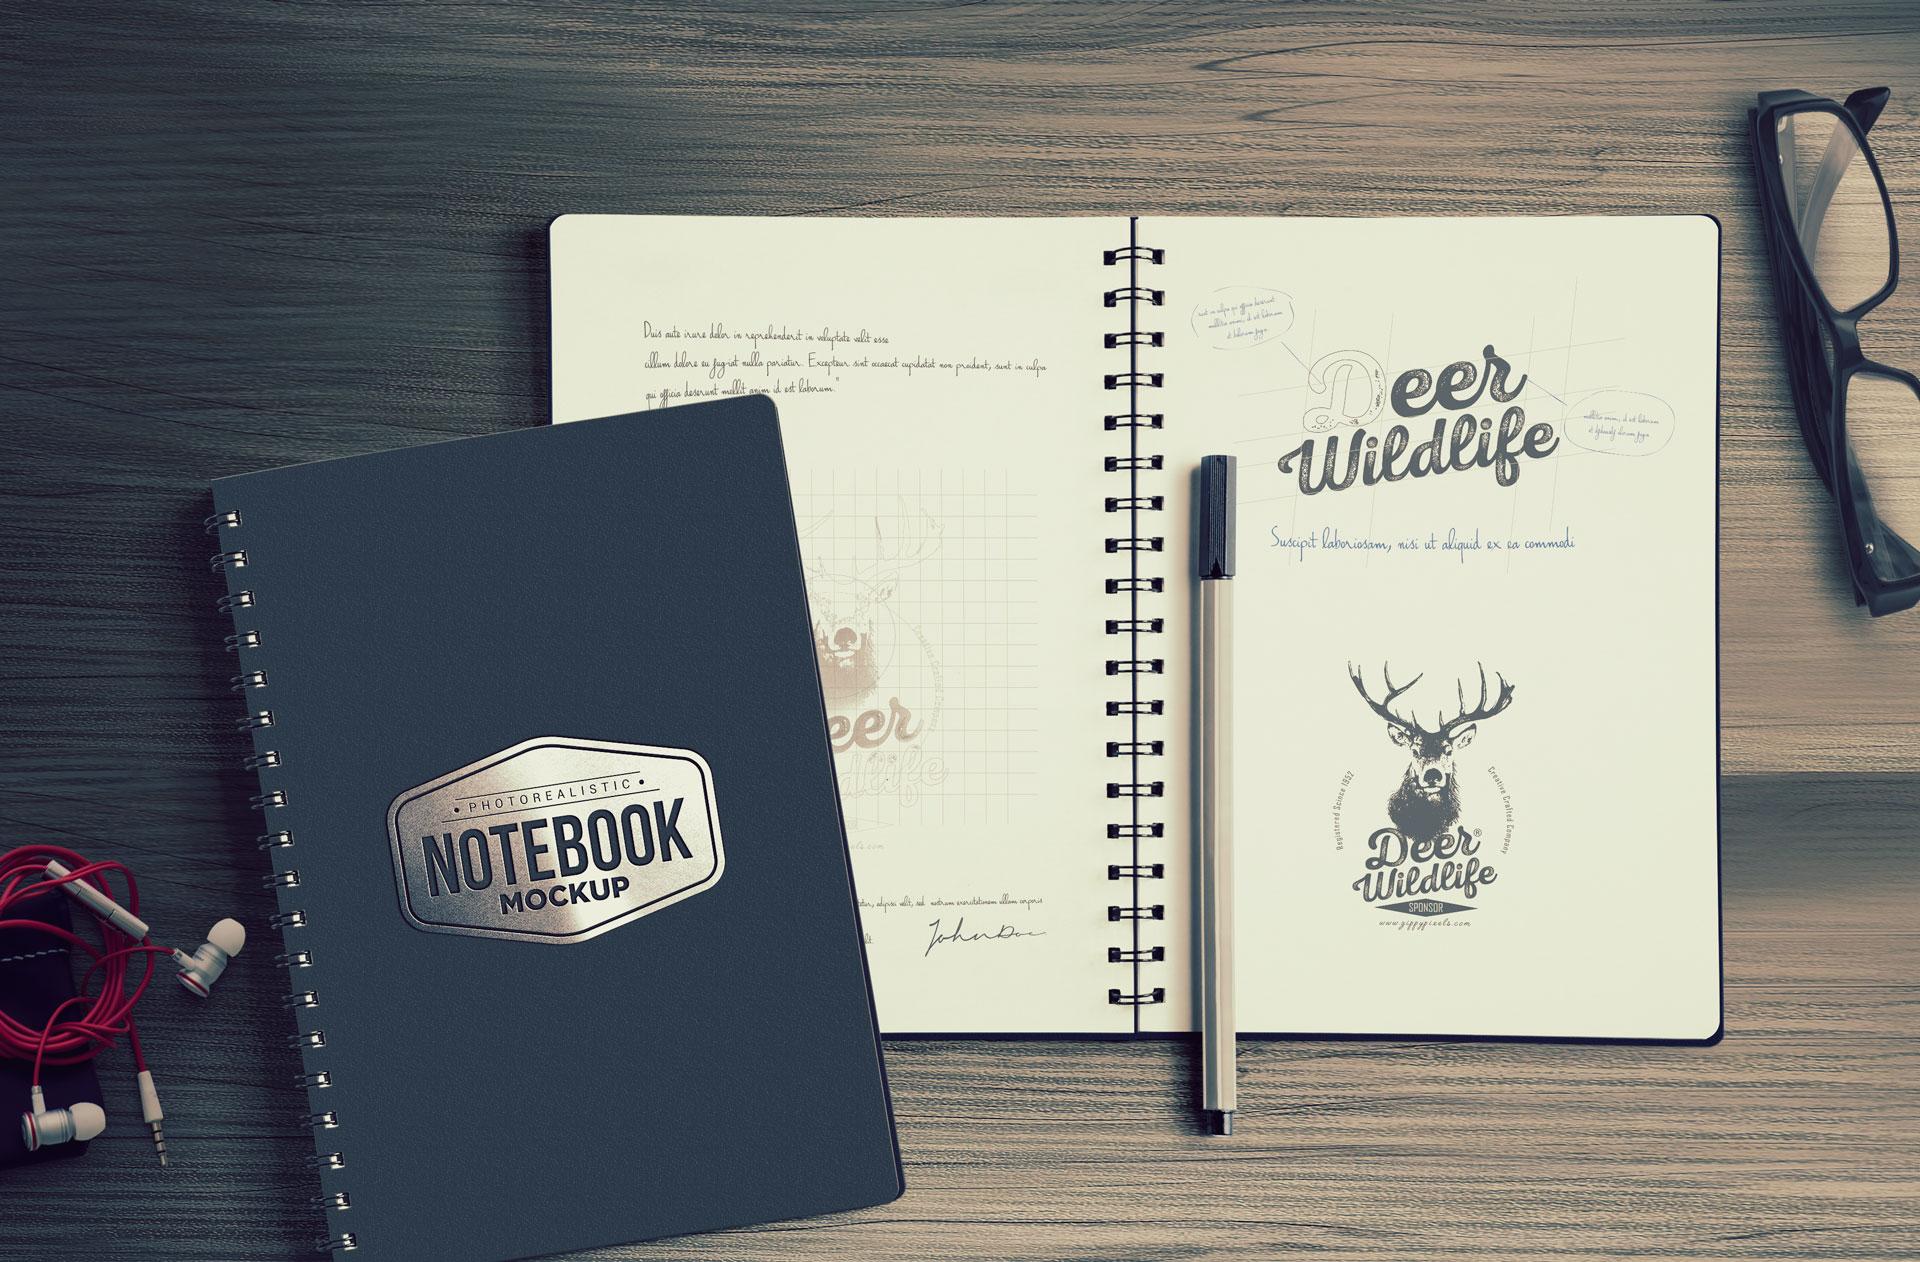 Notebook Mockup Free PSD Download ZippyPixels